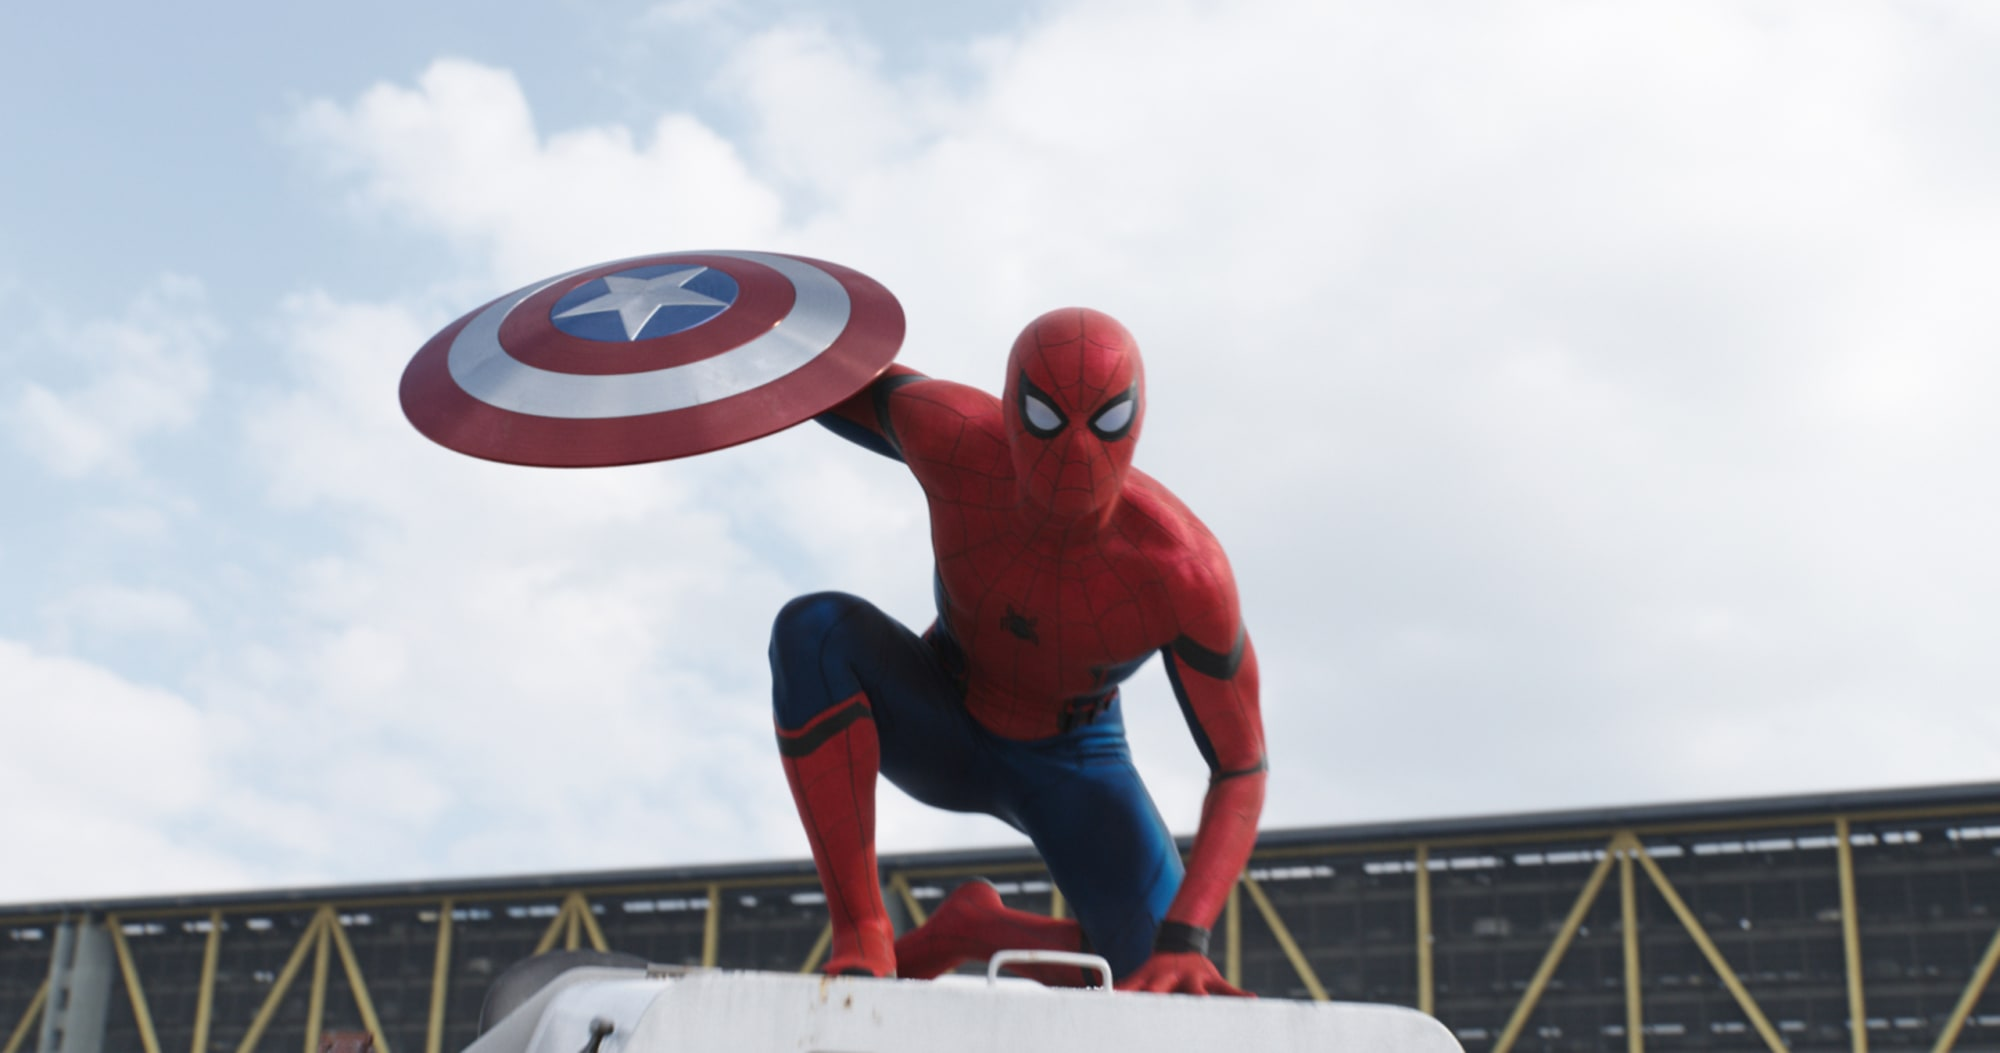 Tom Holland reprises his Spider-Man role at Disneyland's Avengers Campus